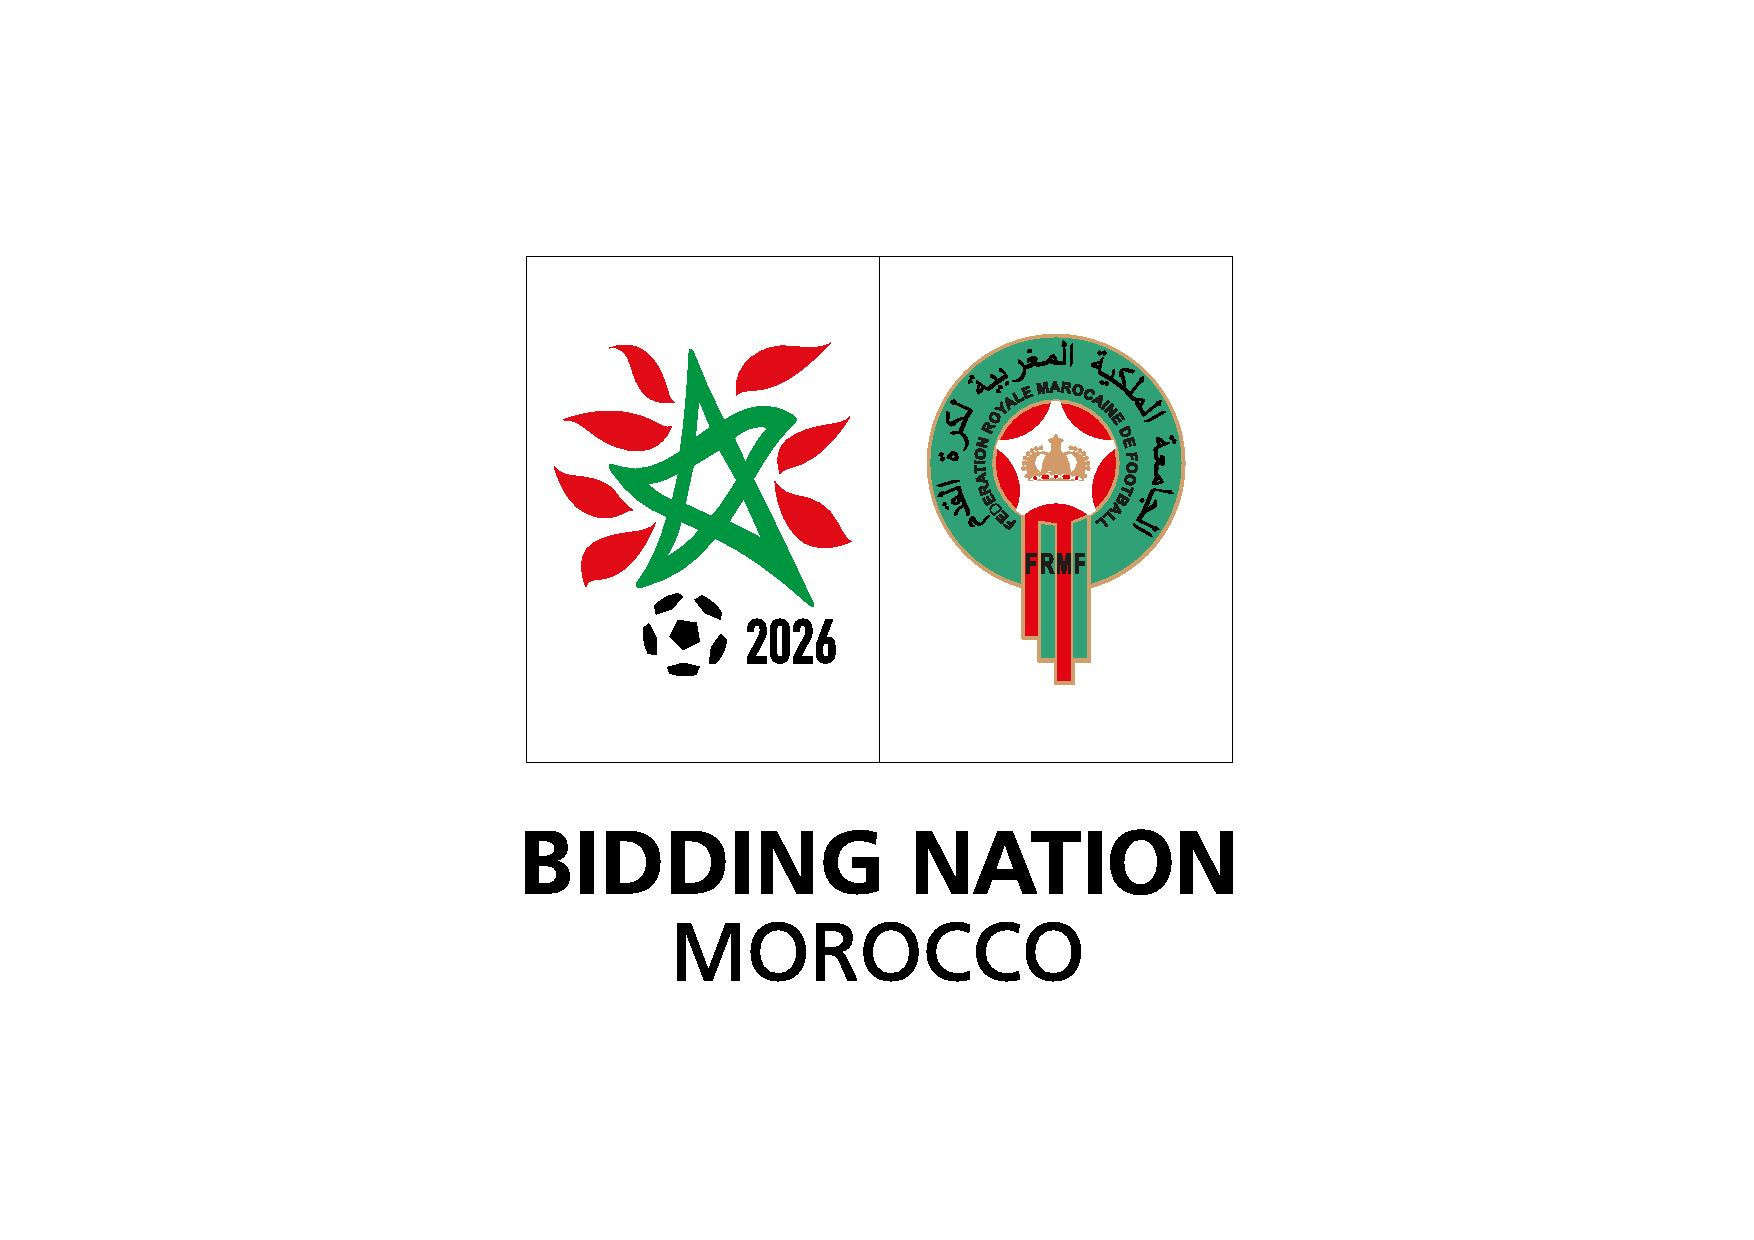 Morocco%202026%20Logo%20(002).jpg